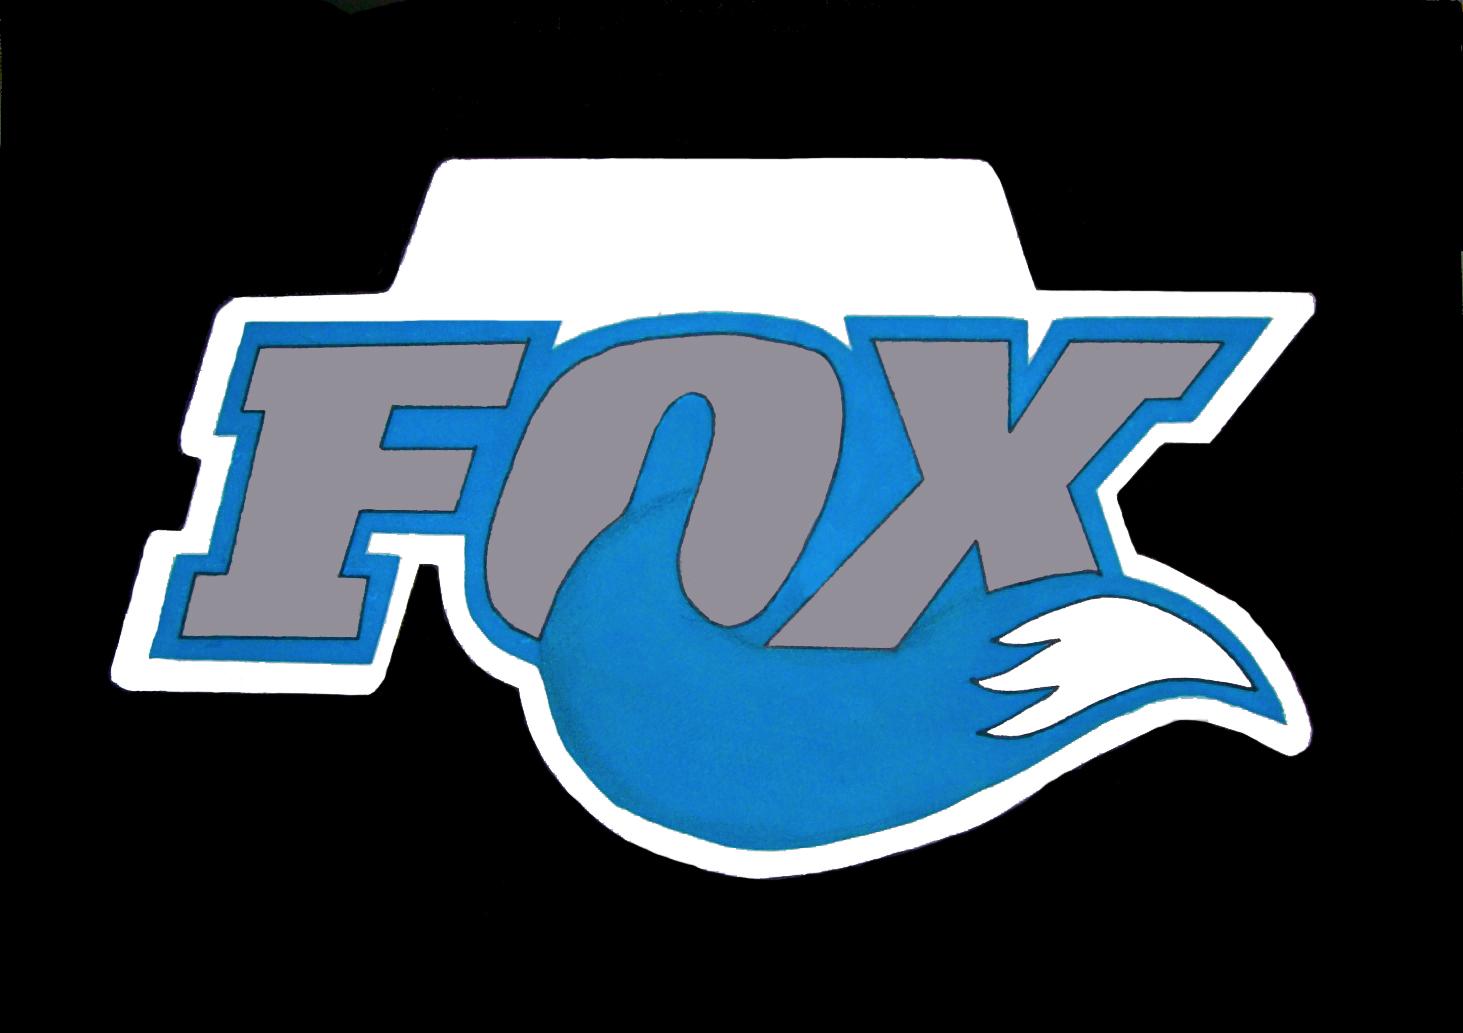 de 2010 logo silver fox by phoenixkai on deviantart fox logo 5 00 1463x1033